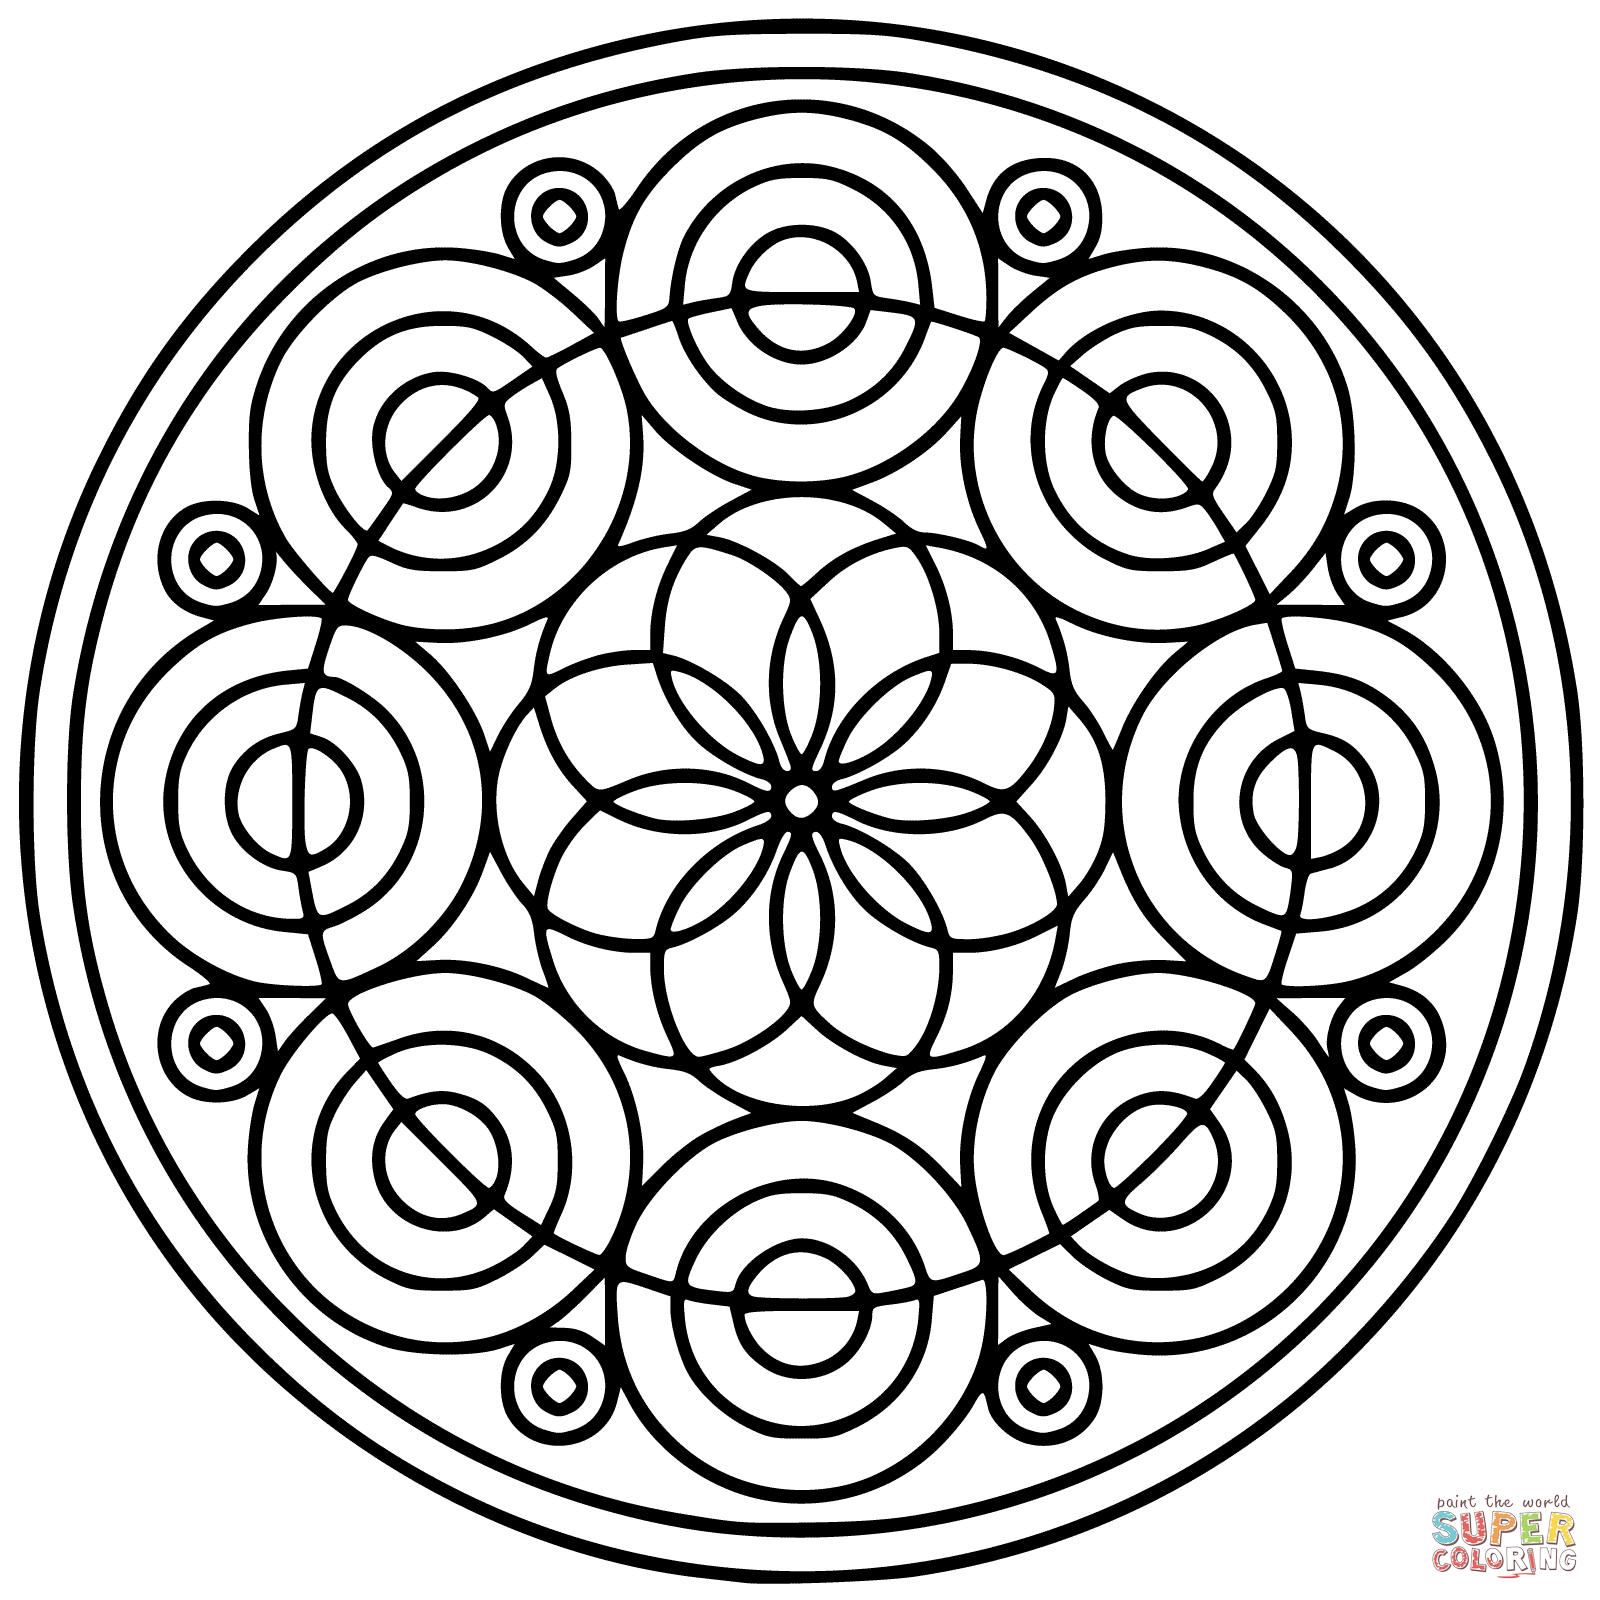 Spiral coloring, Download Spiral coloring